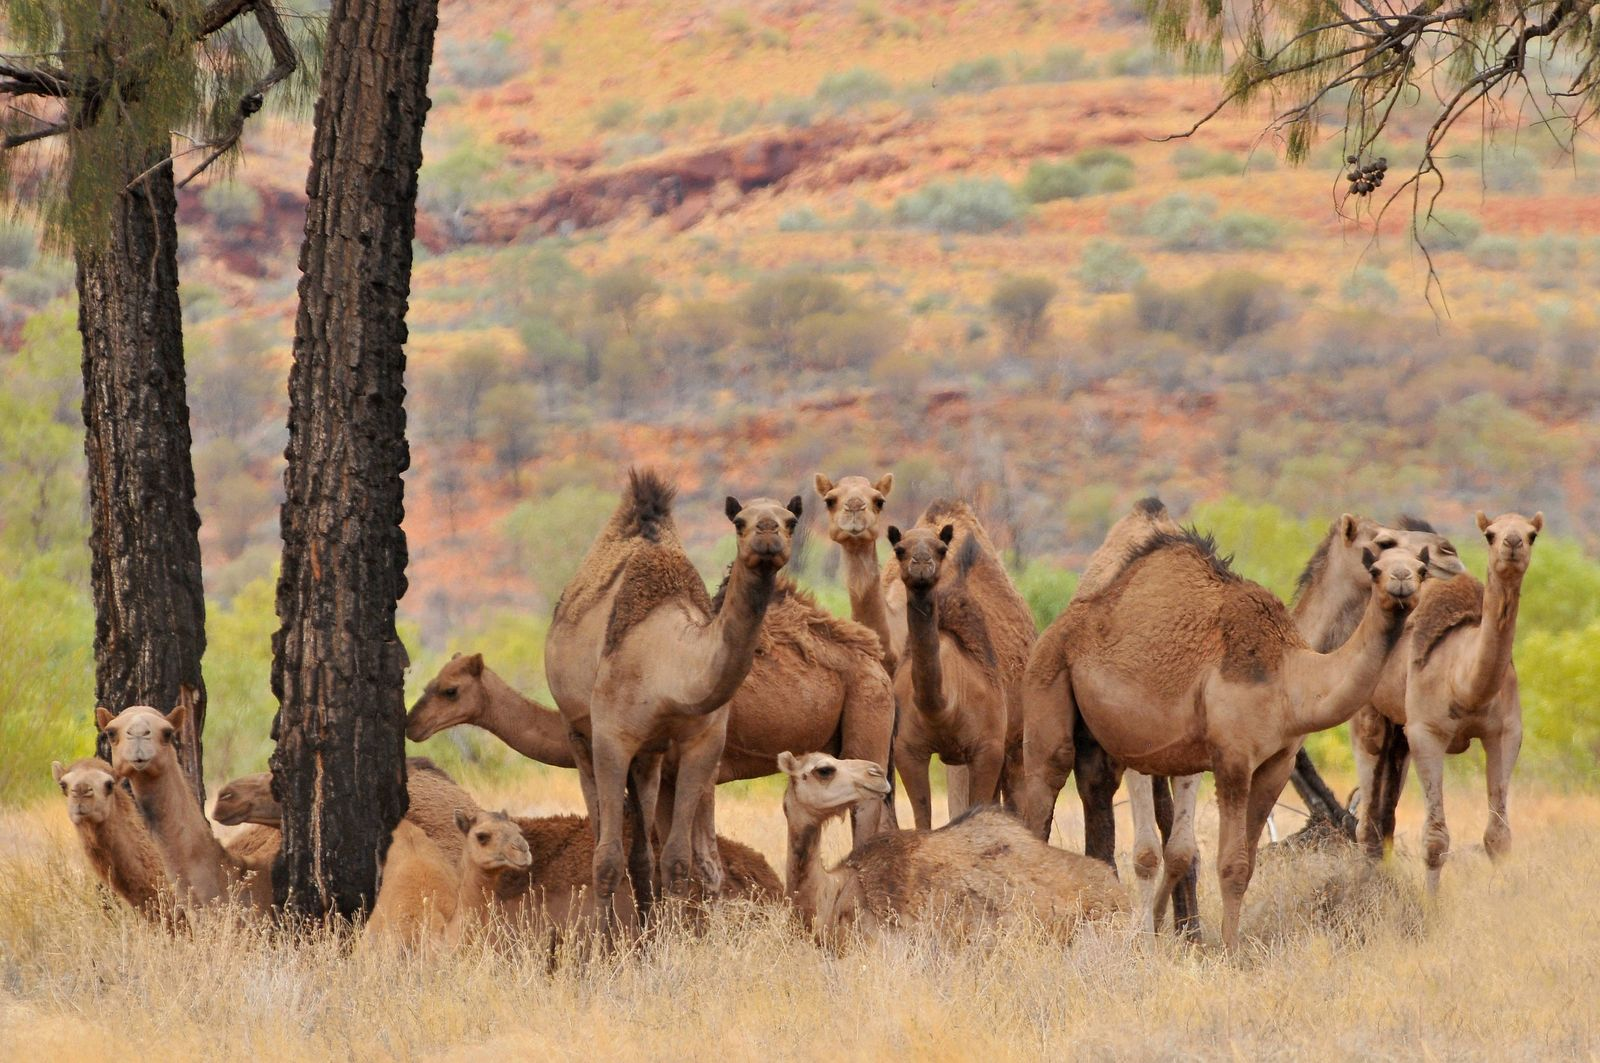 Australia, Outback, Northern Territory, Australian feral dromedary camel